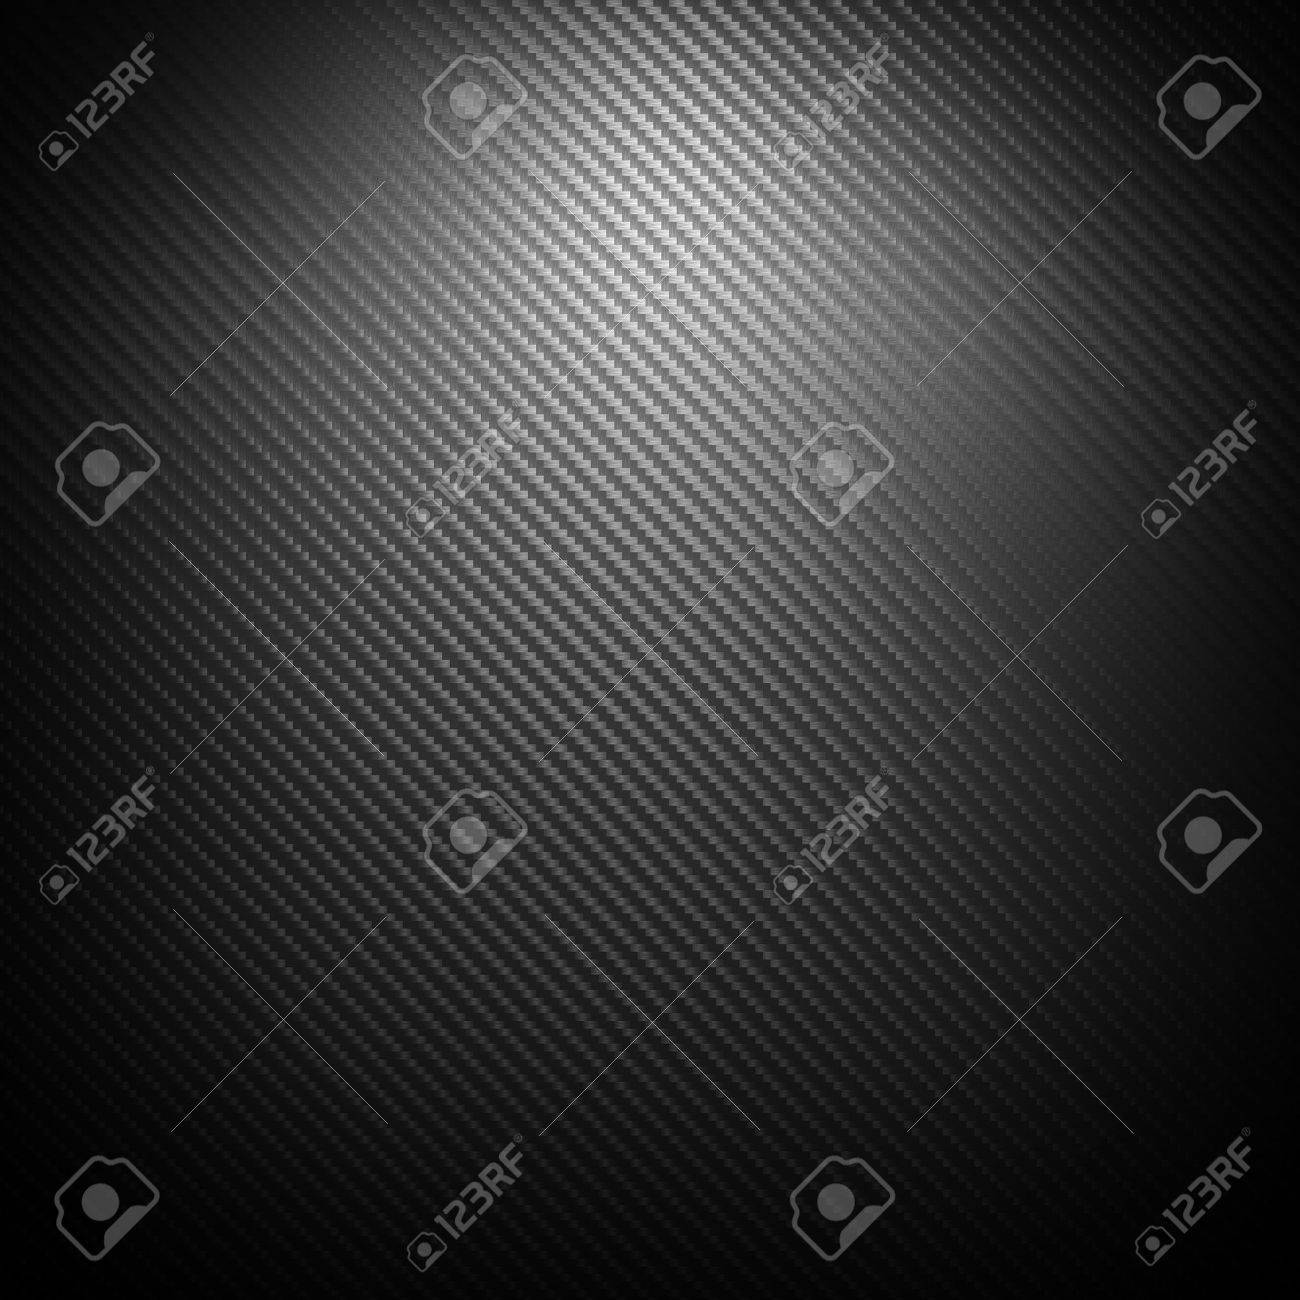 3d image of classic carbon fiber texture - 49855113